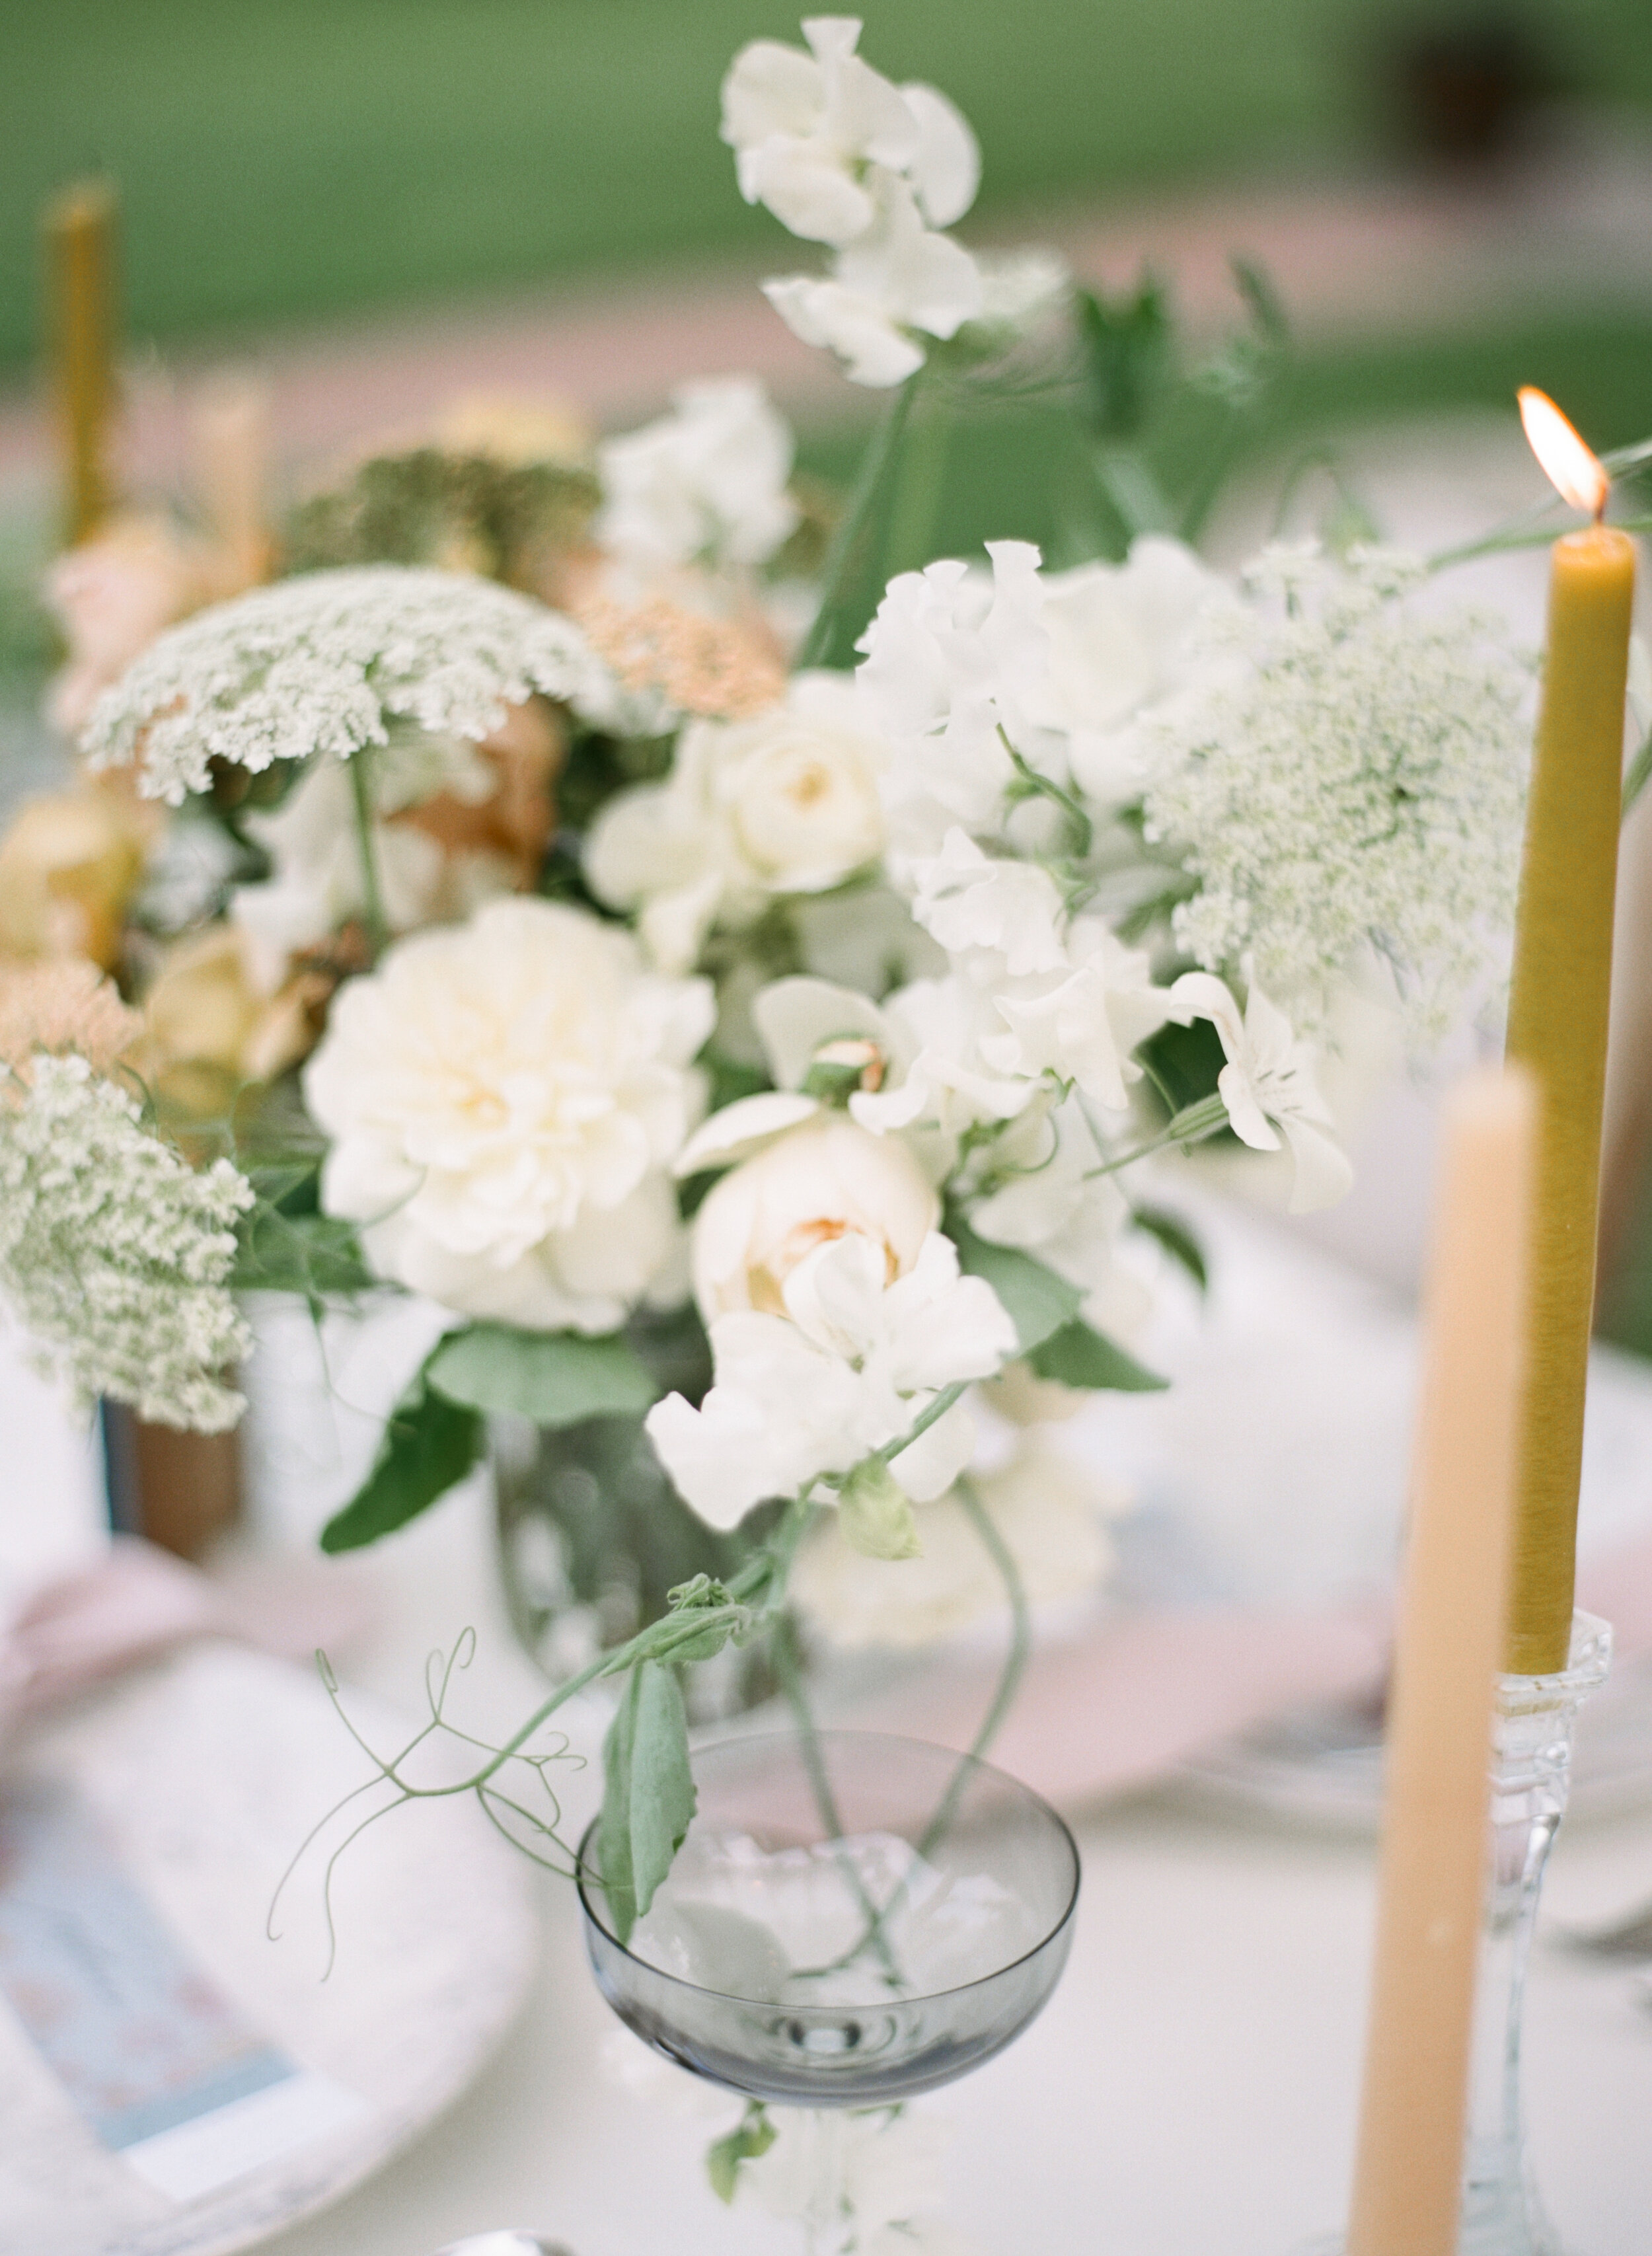 alexandra-meseke-understated-soft-luxury-wedding-upstate-ny_0138.jpg